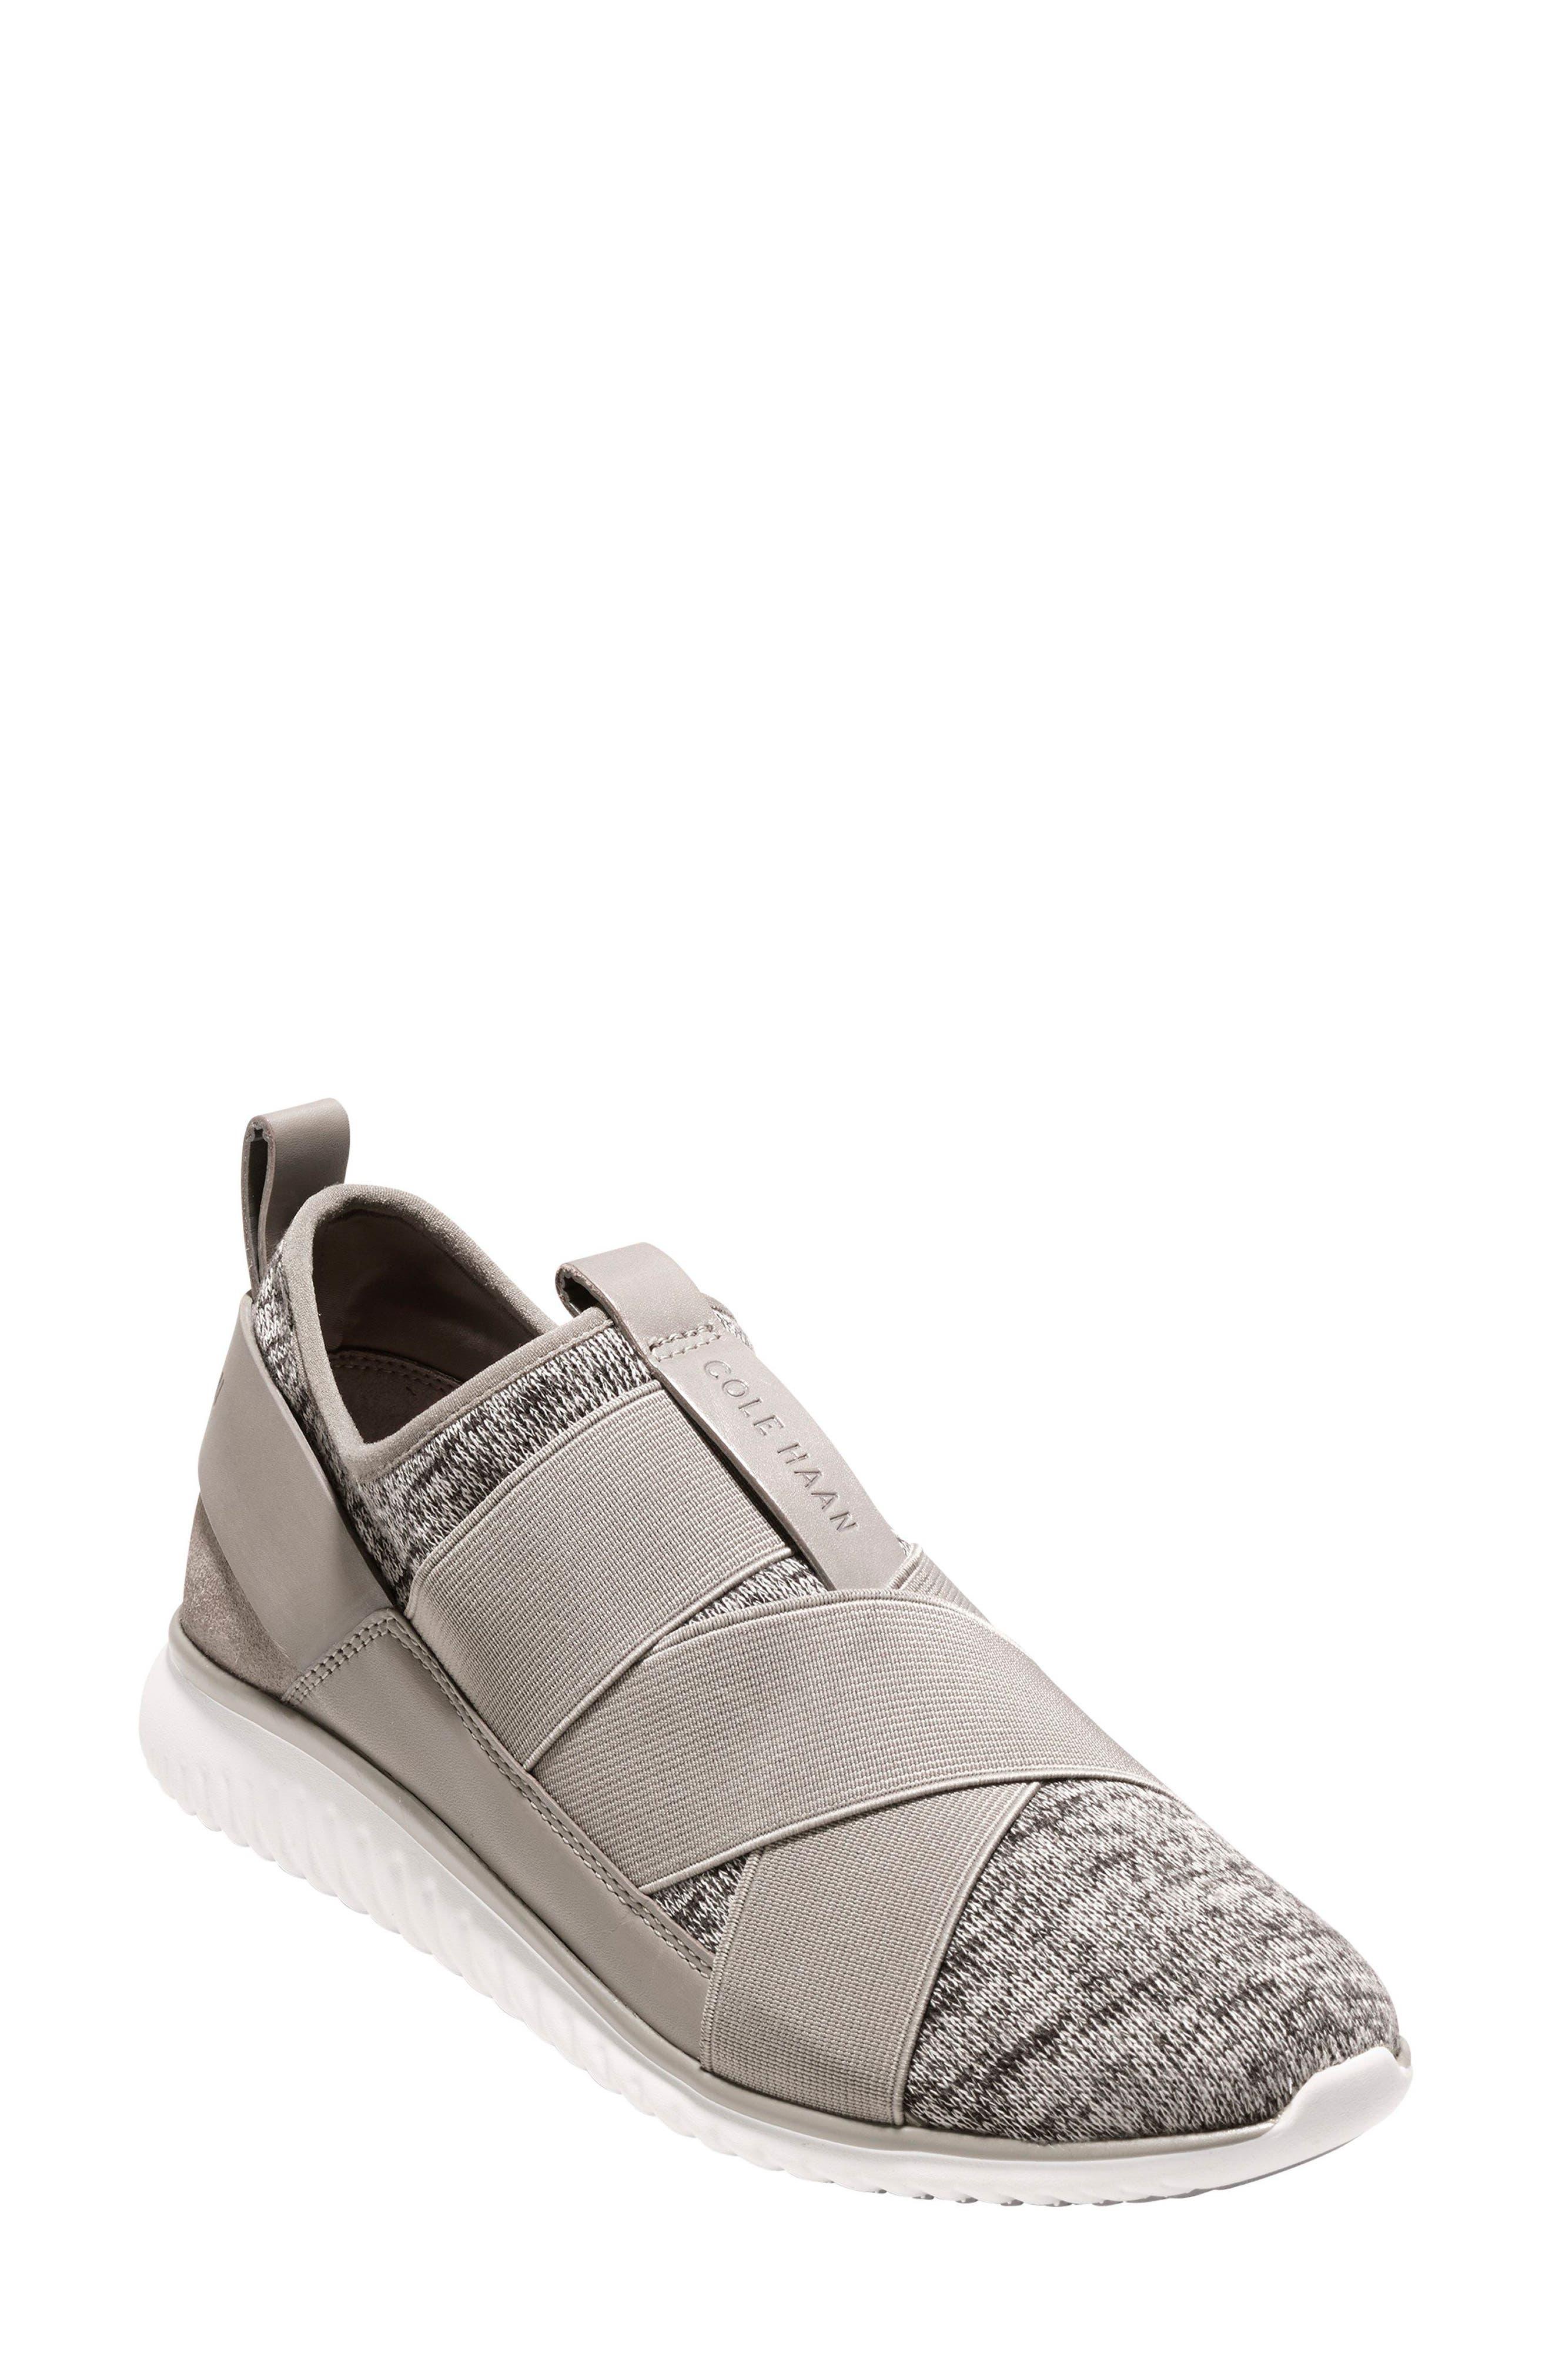 'StudioGrand' Sneaker,                         Main,                         color, Rockridge/ Pumice Stone Fabric